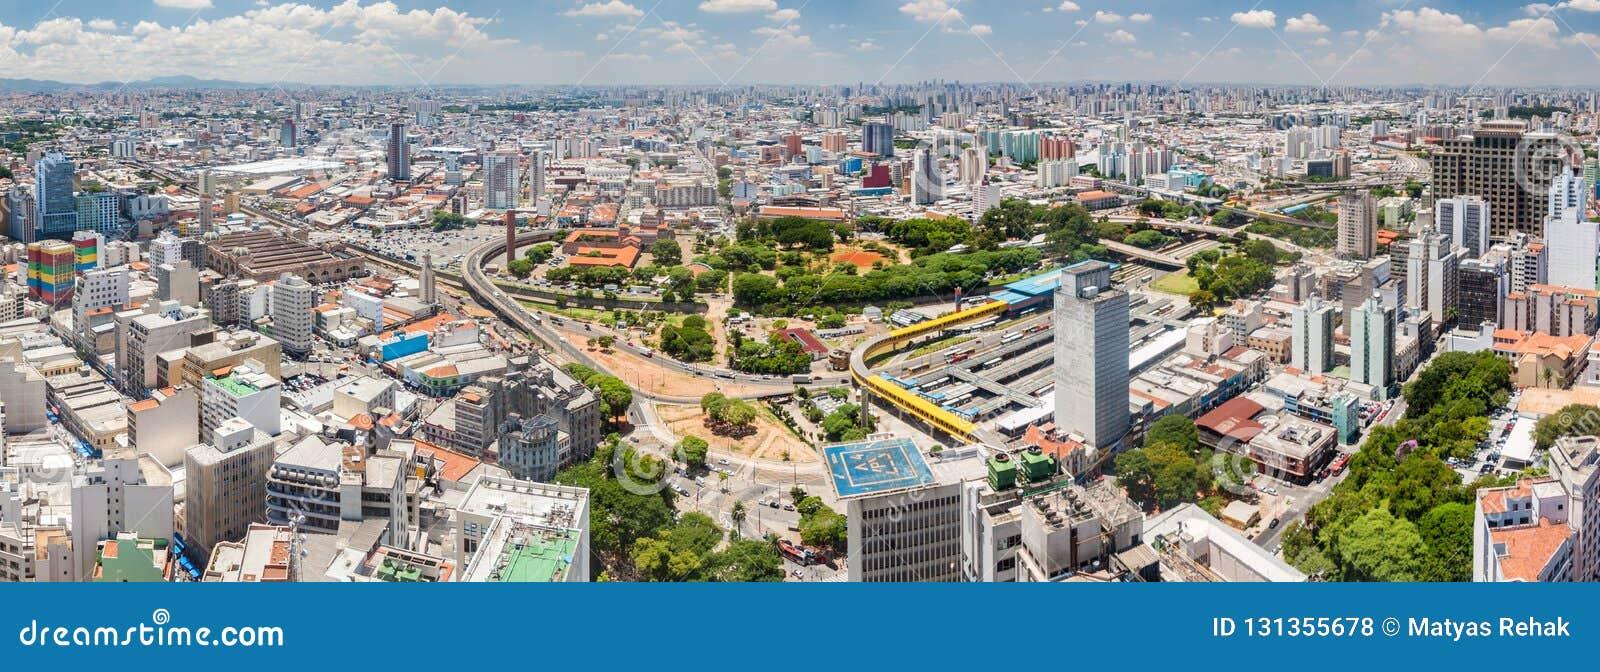 Panorama São Paulo fonte: thumbs.dreamstime.com